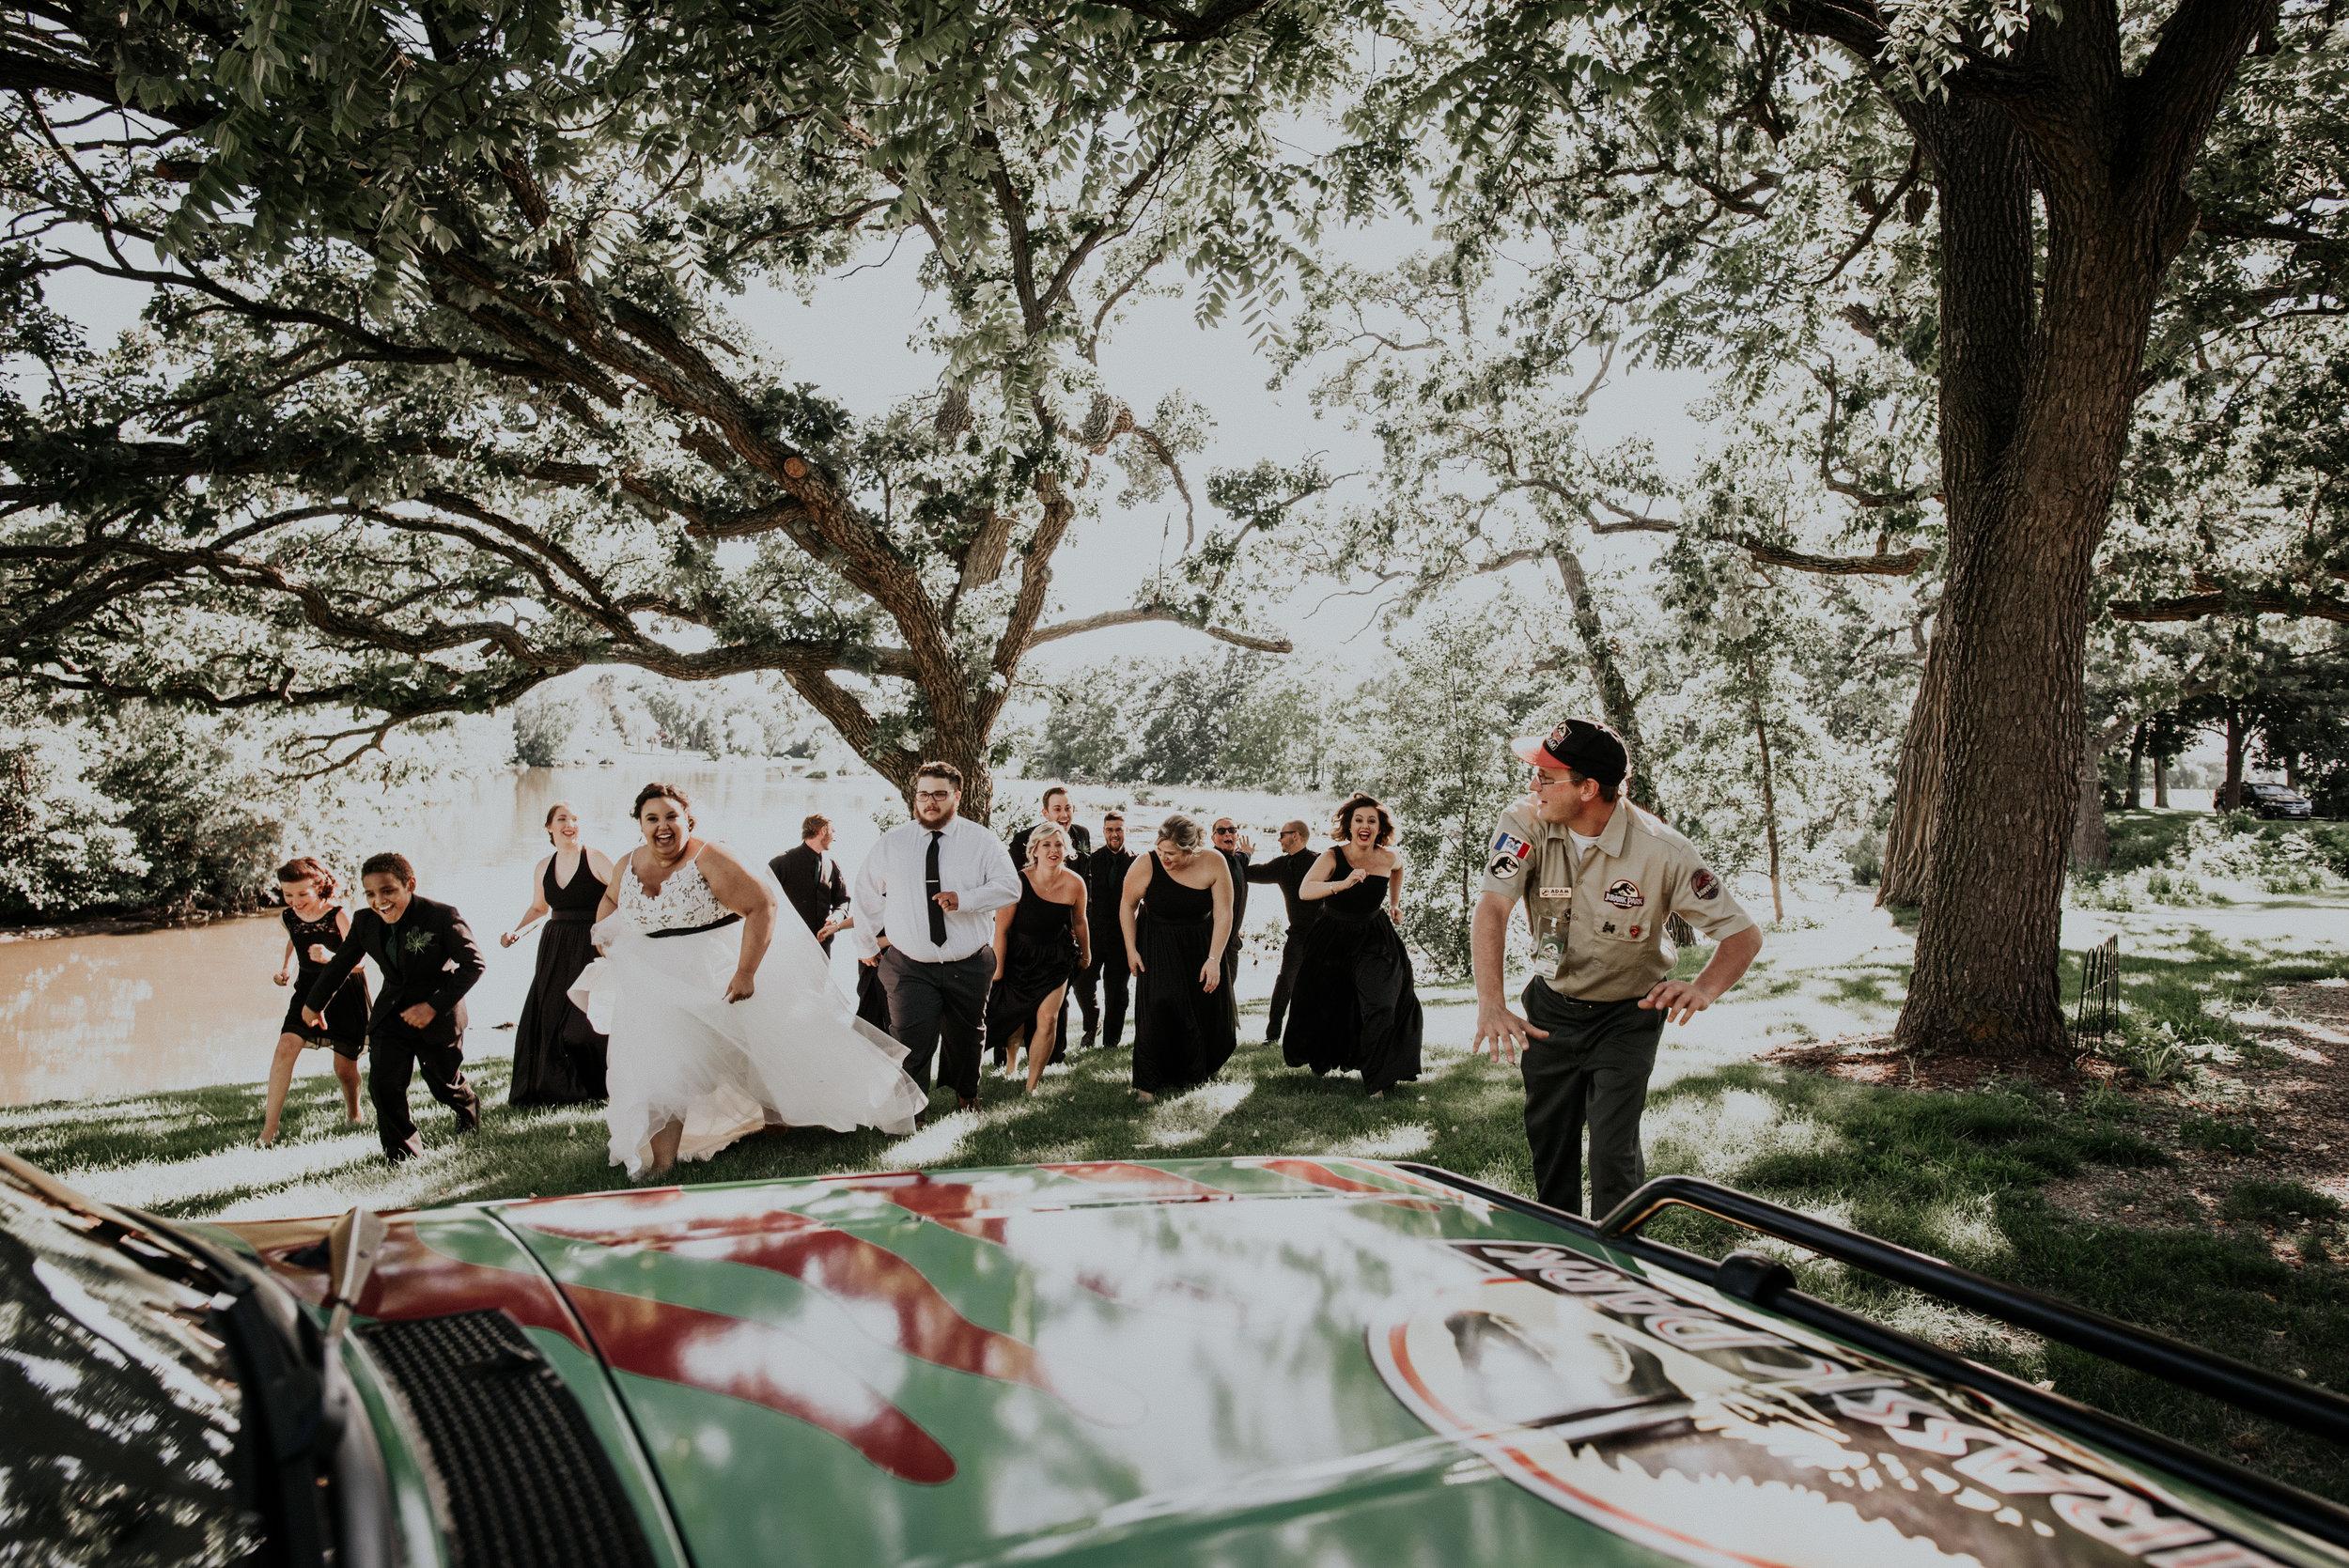 BridesbyYoung-RealWedding-PlusSizeBridal-BillyCourtney-JurassicParkTheme-37.jpg